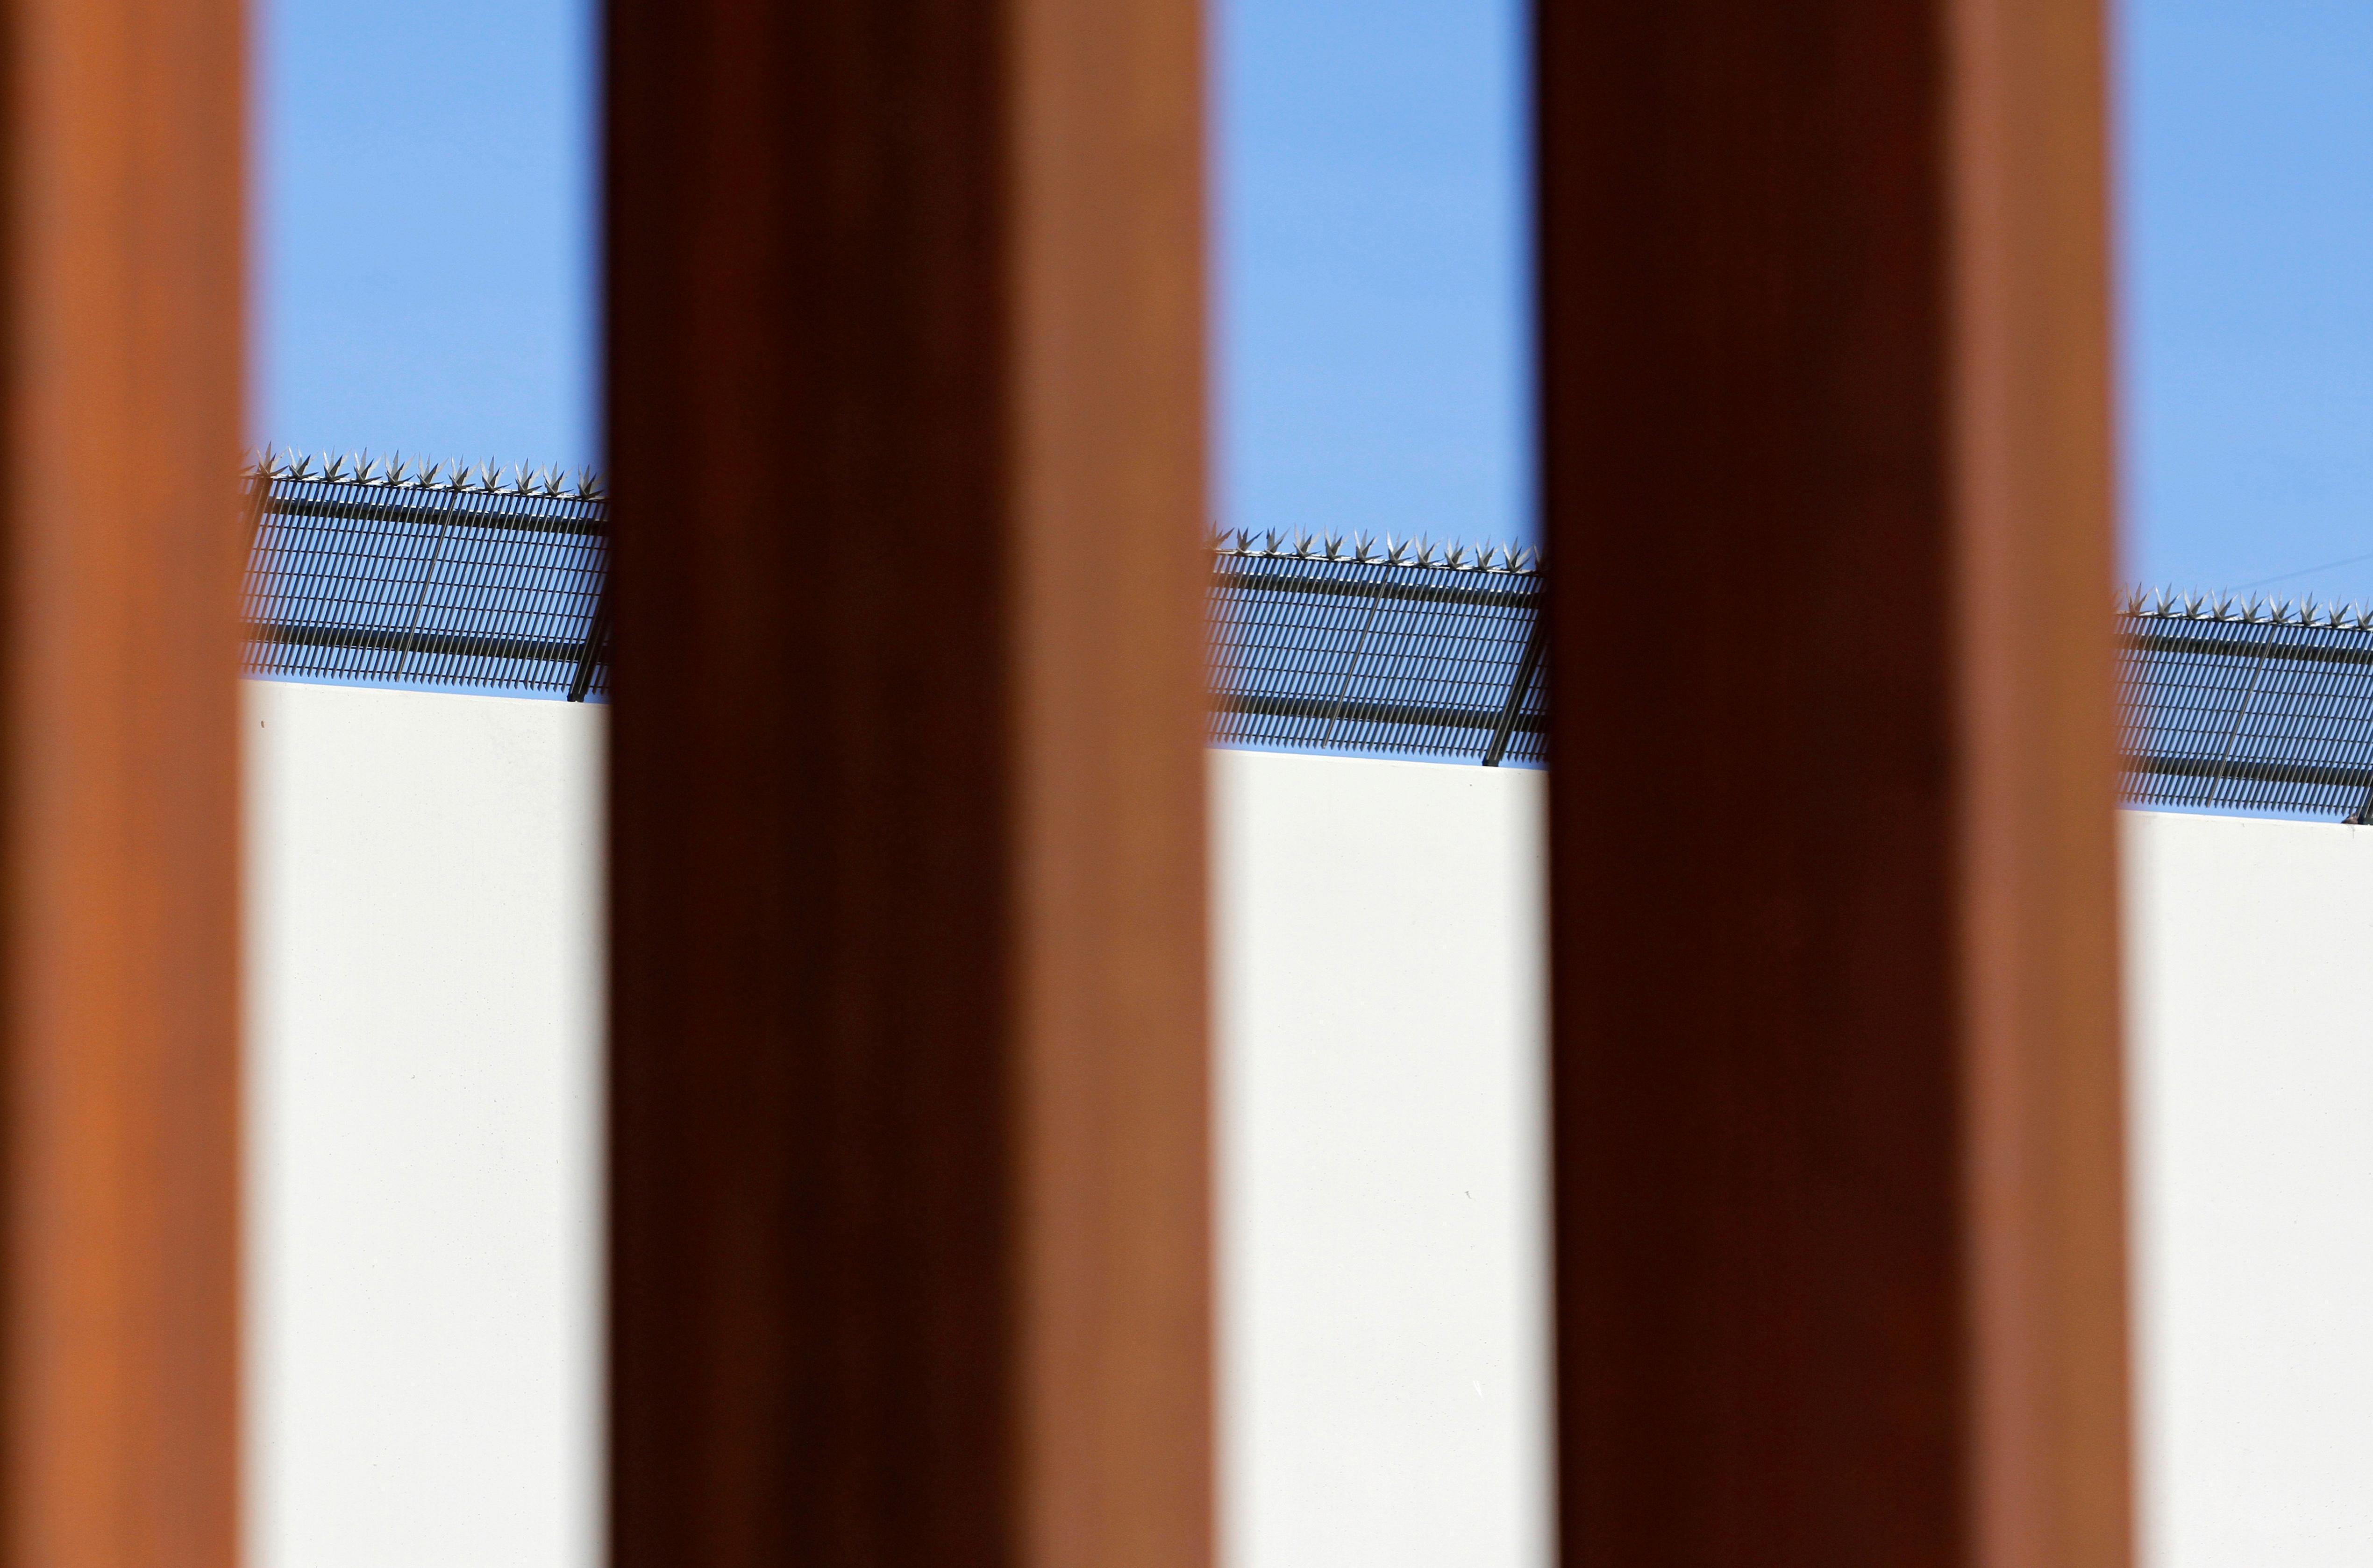 U.S. lawmakers to hold border security talks in bid to avert shutdown